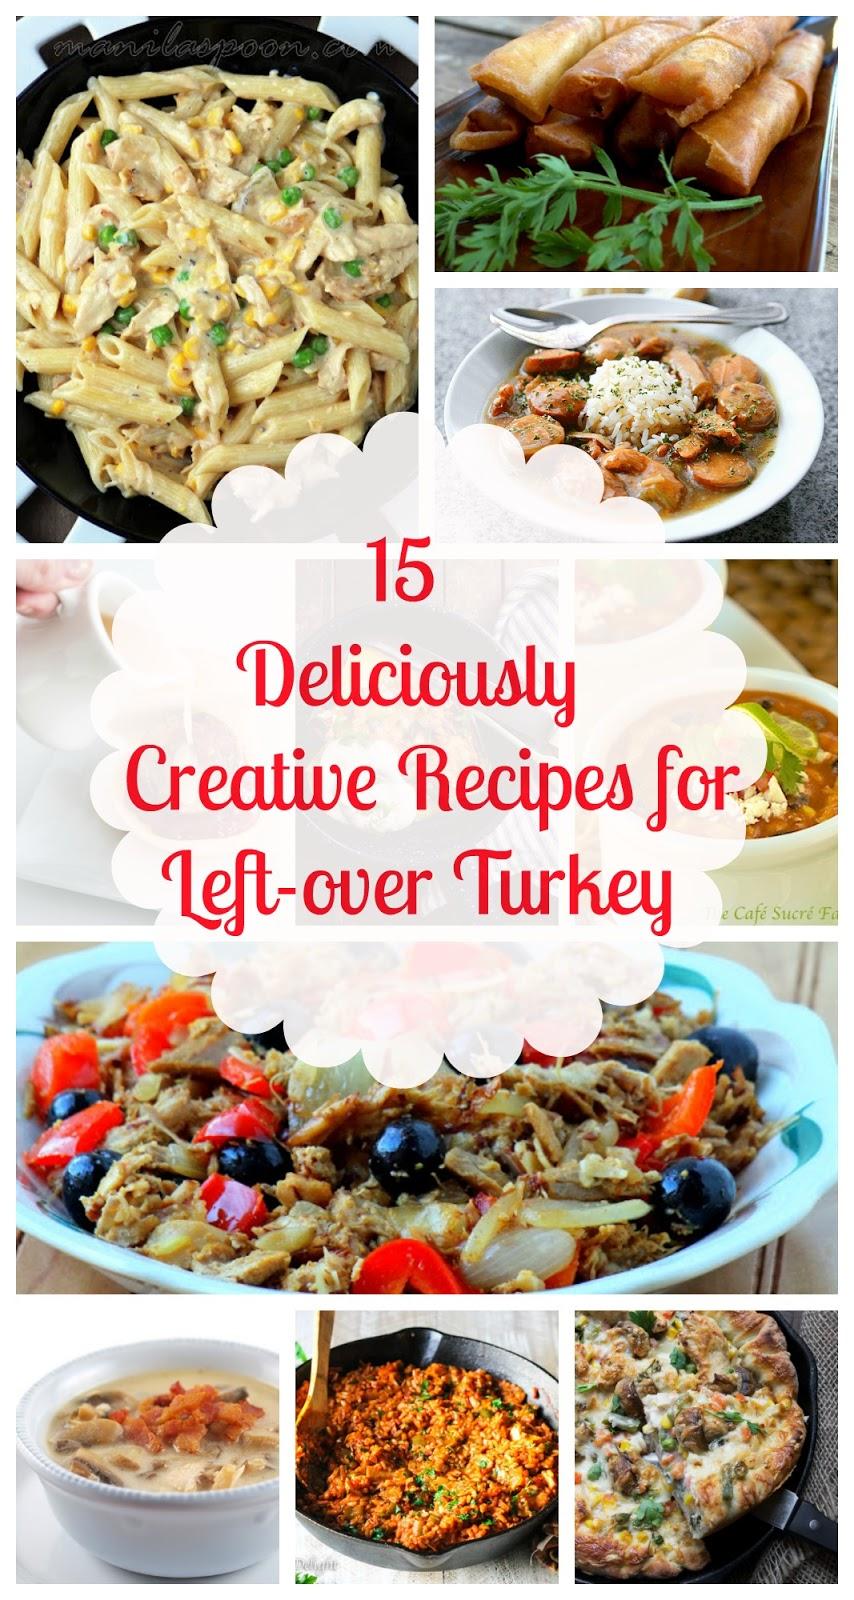 15 Deliciously Creative Left-over Turkey Recipes